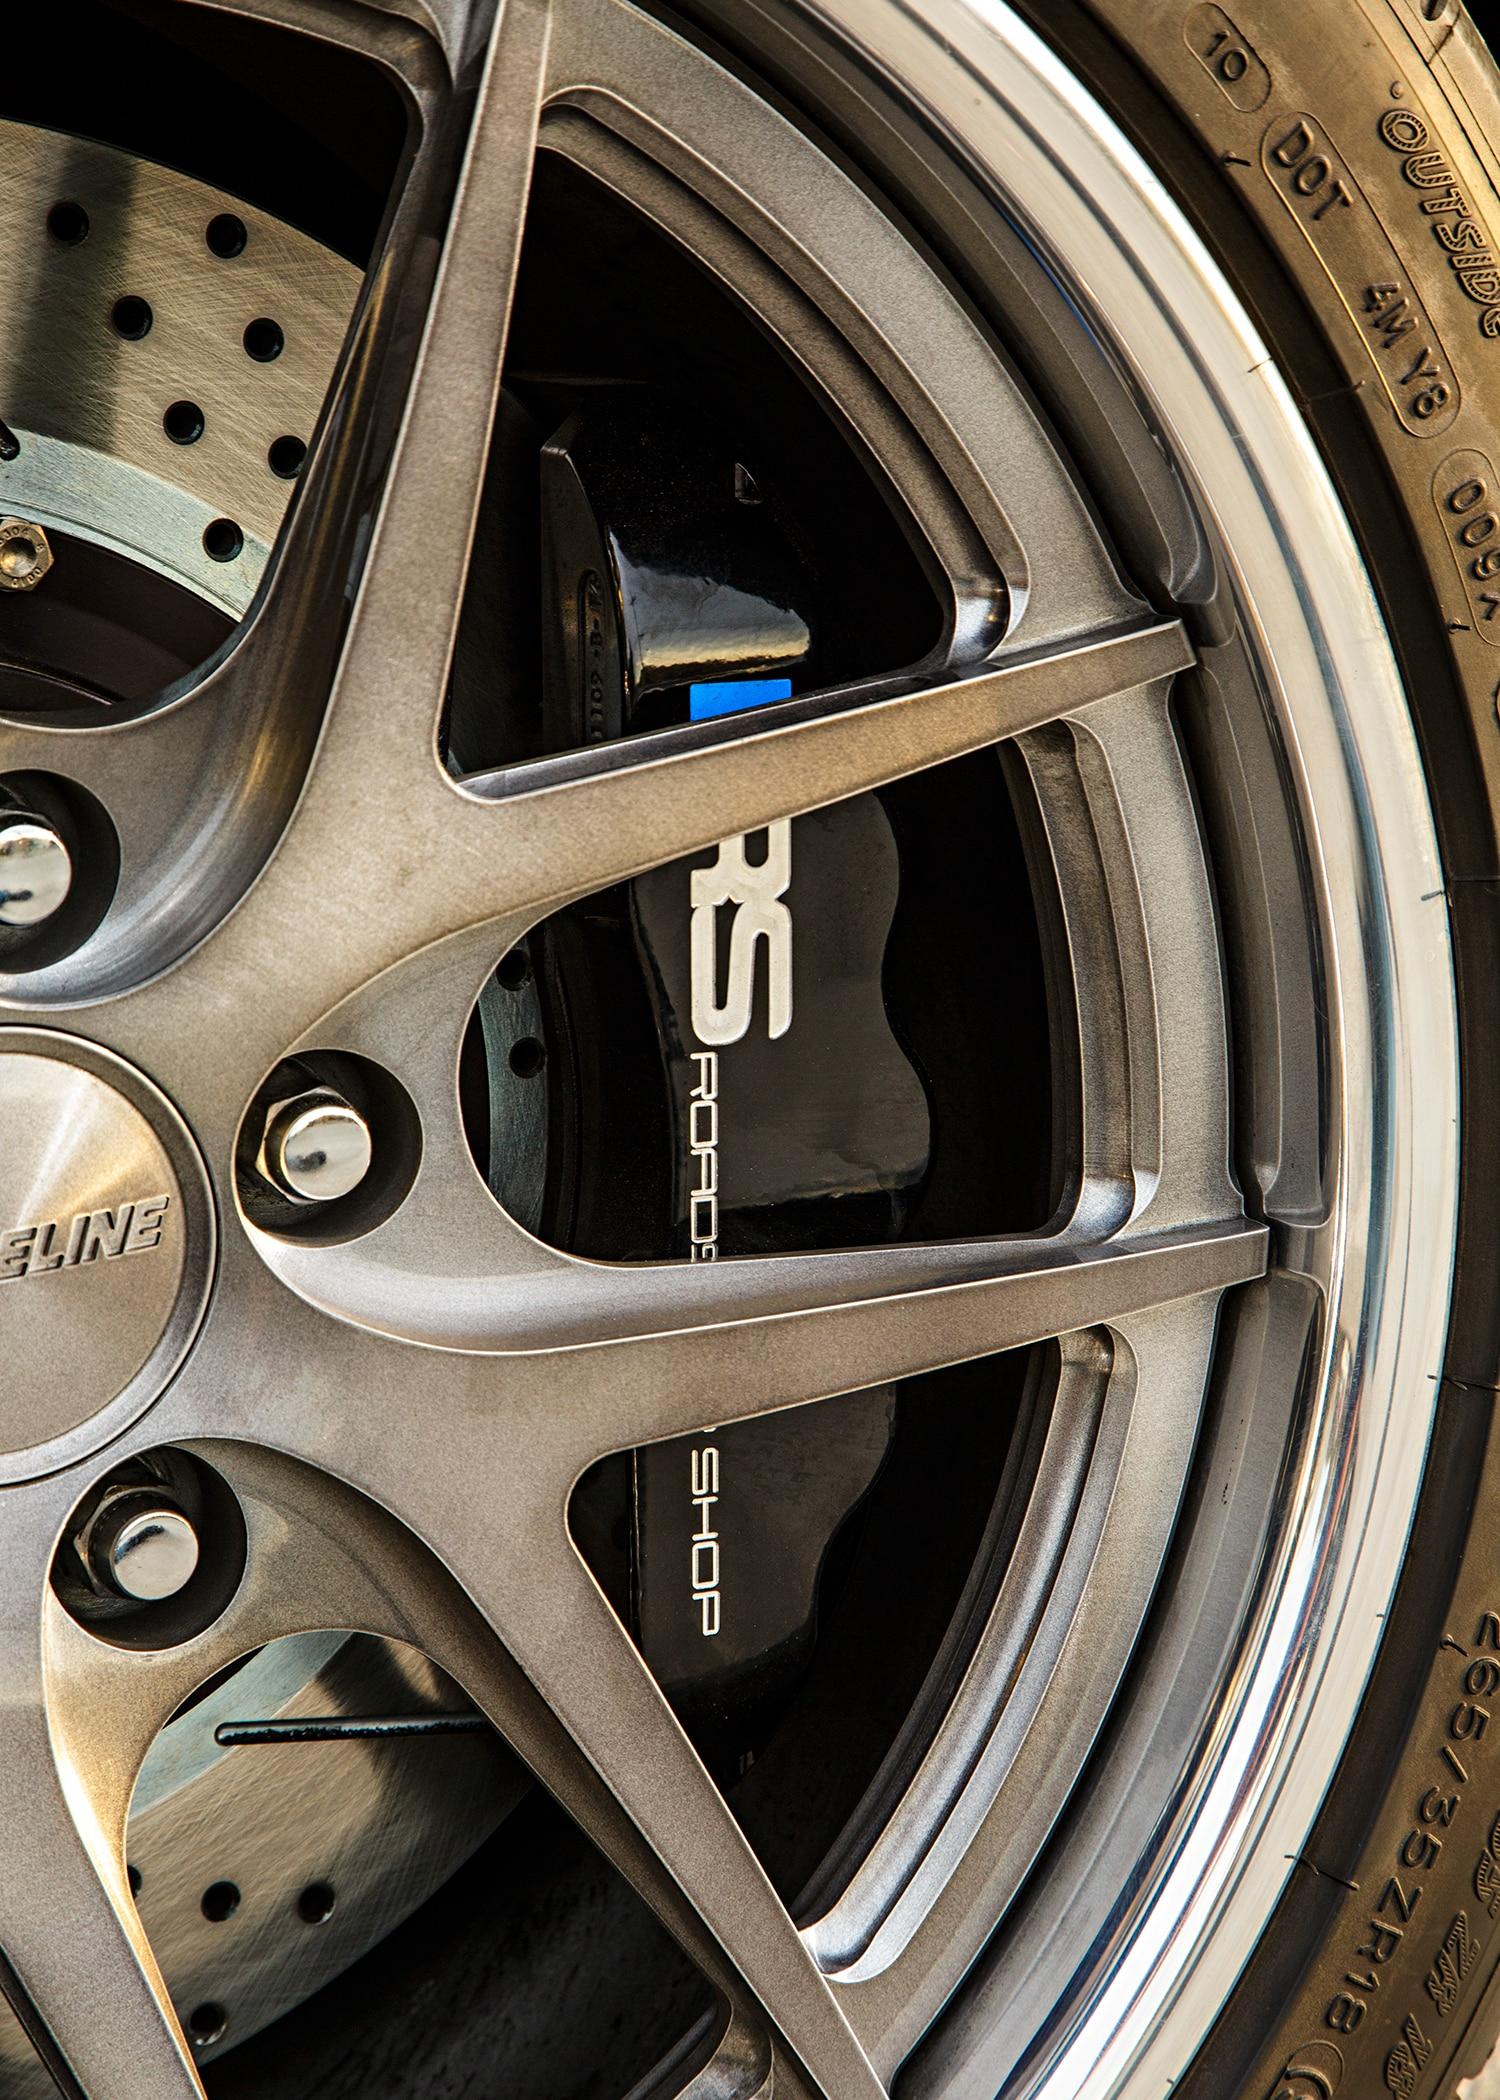 1965 Ford Mustang Wheel Detail